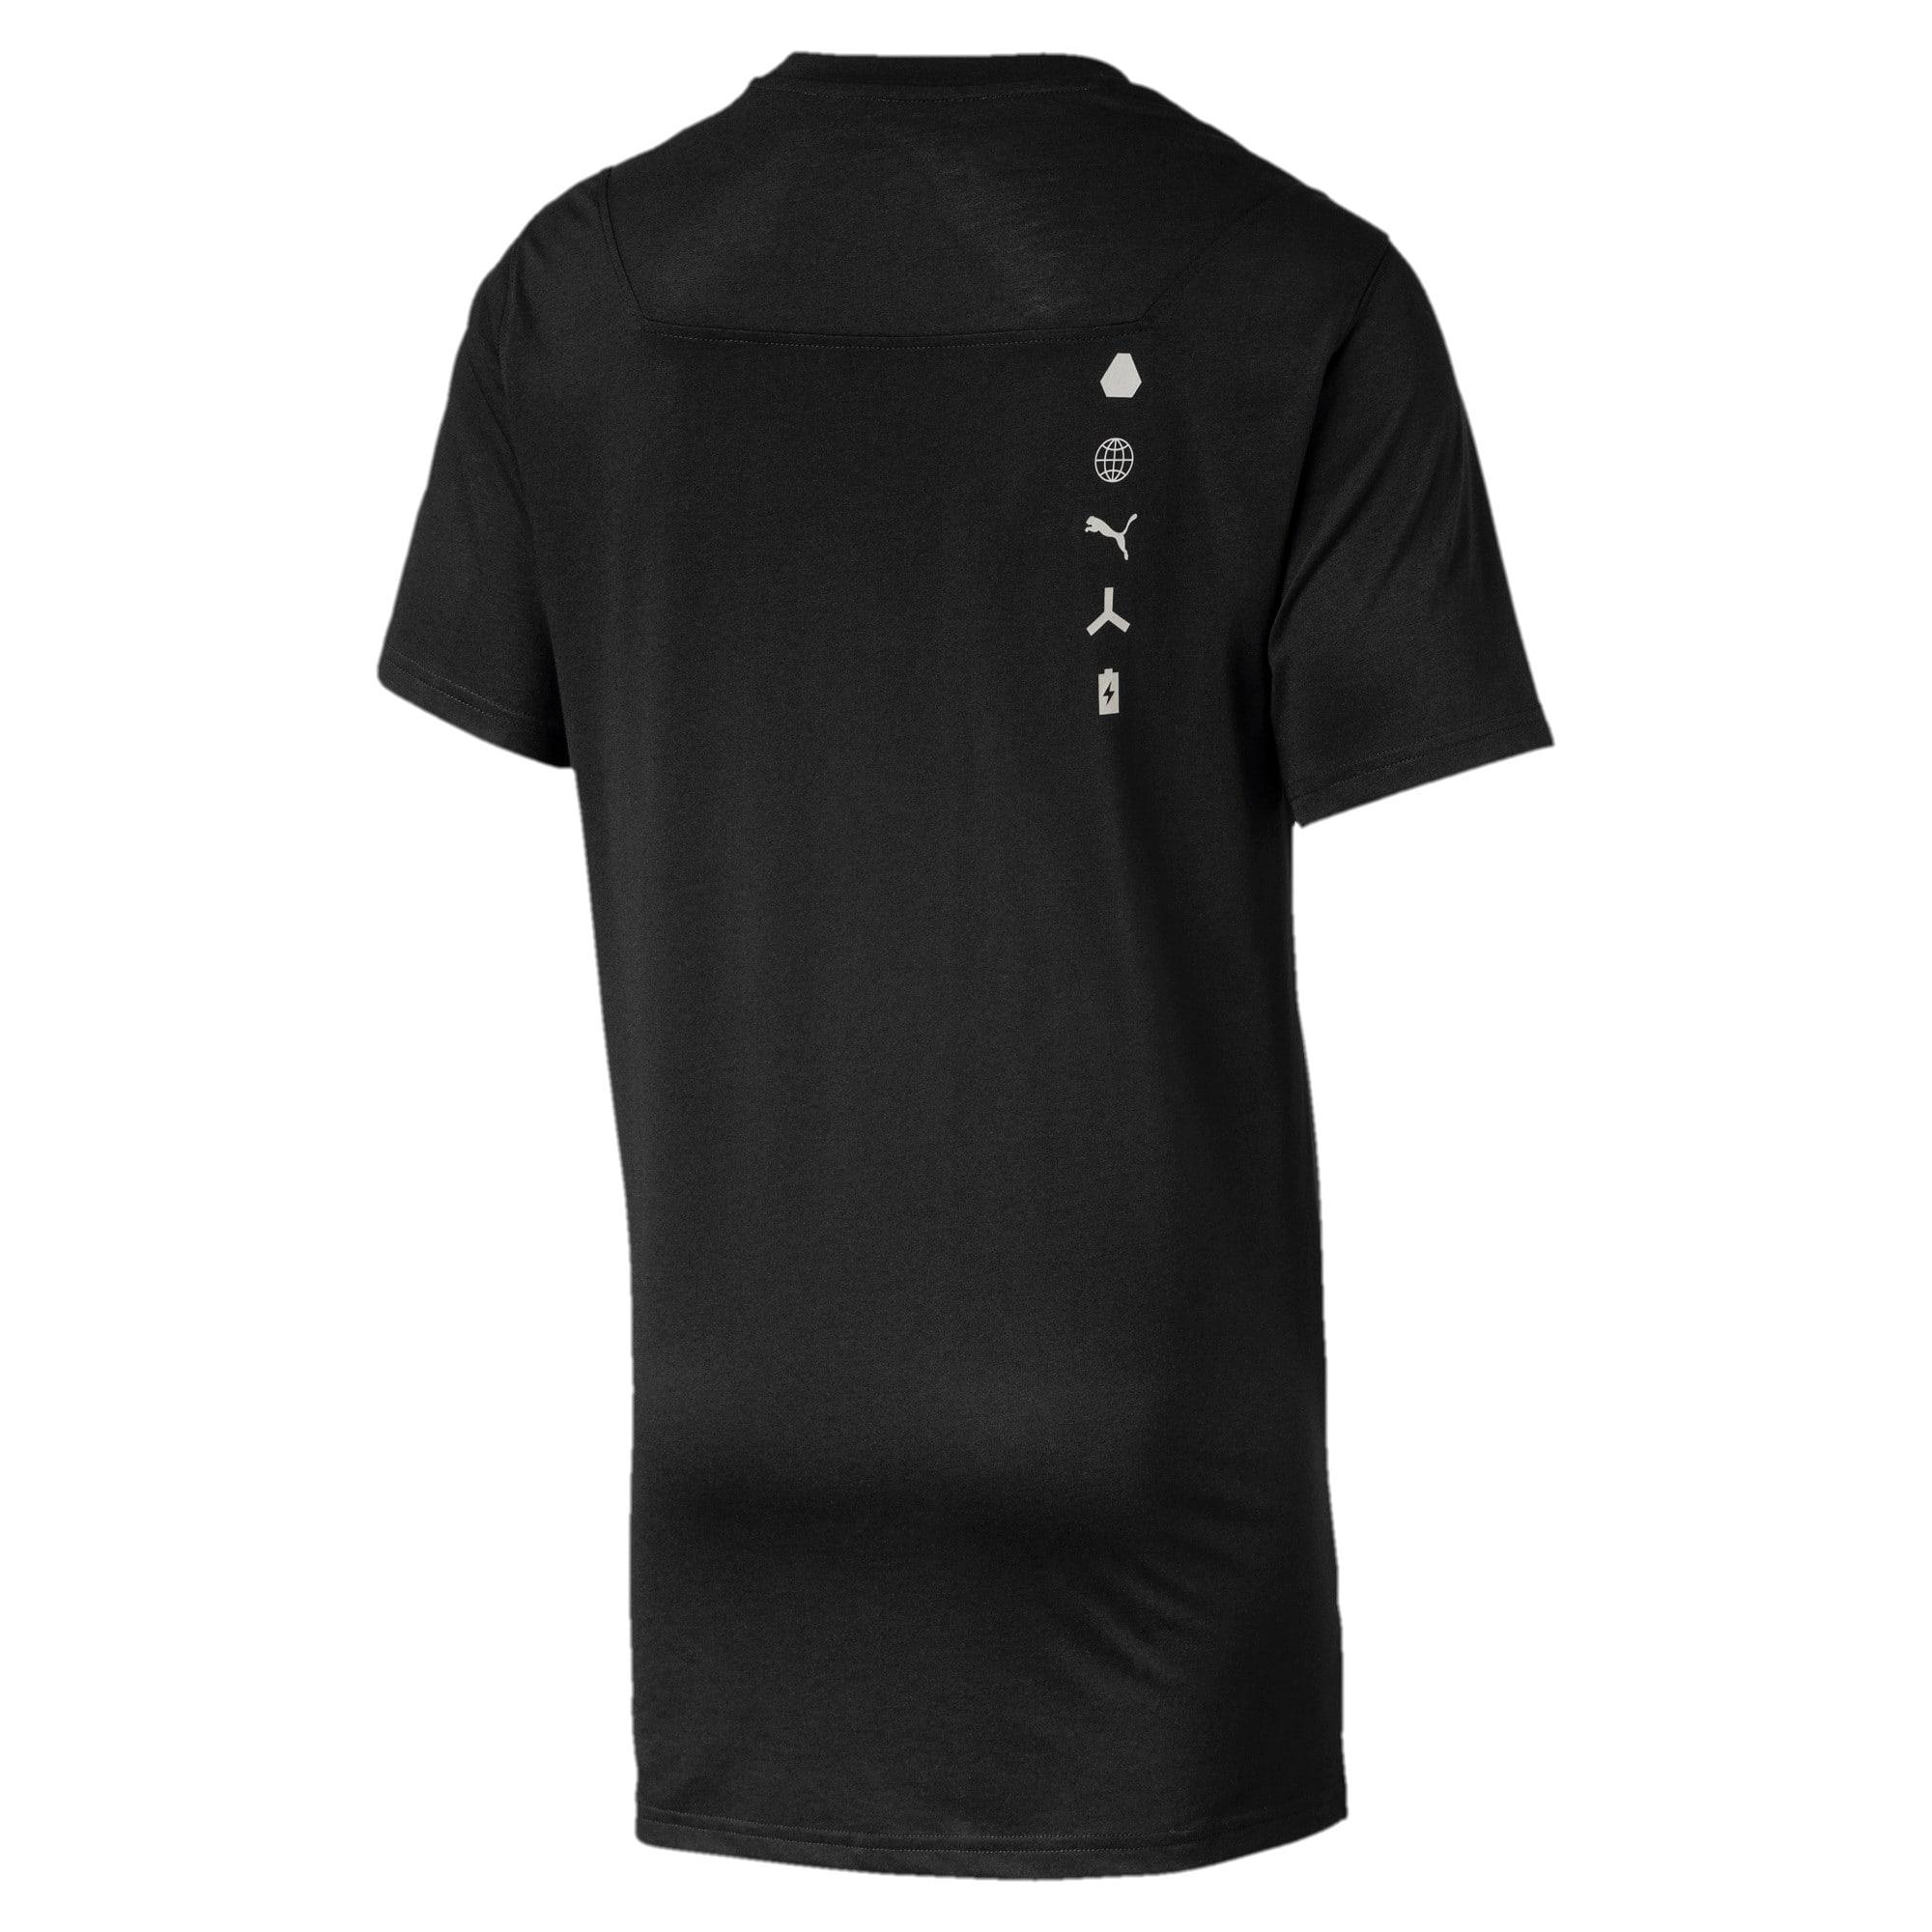 Thumbnail 3 of Energy Desert SNR Short Sleeve Men's Training Top, Puma Black, medium